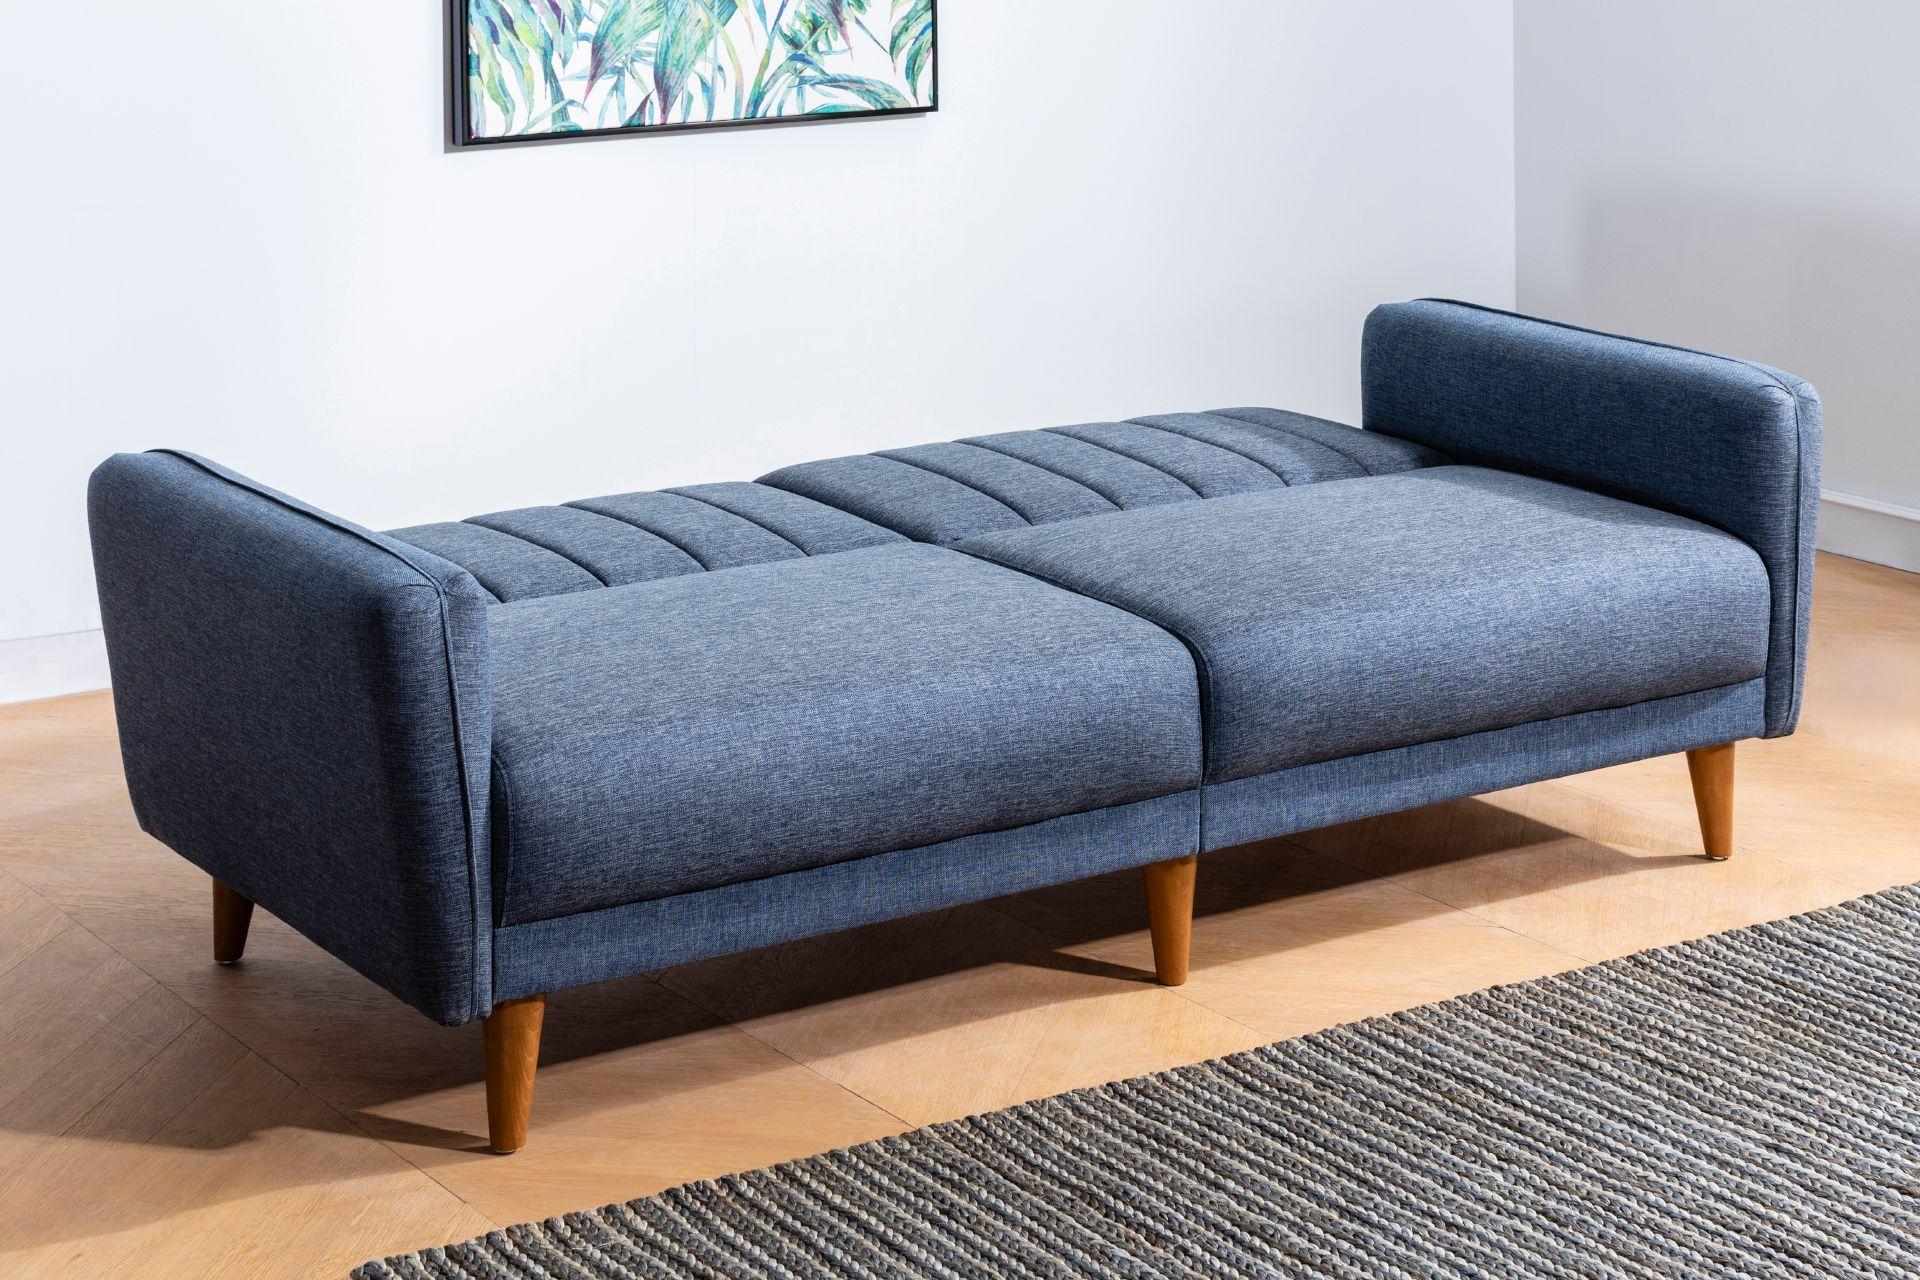 Aqua Three Seater Sofa Bed, Navy Blue